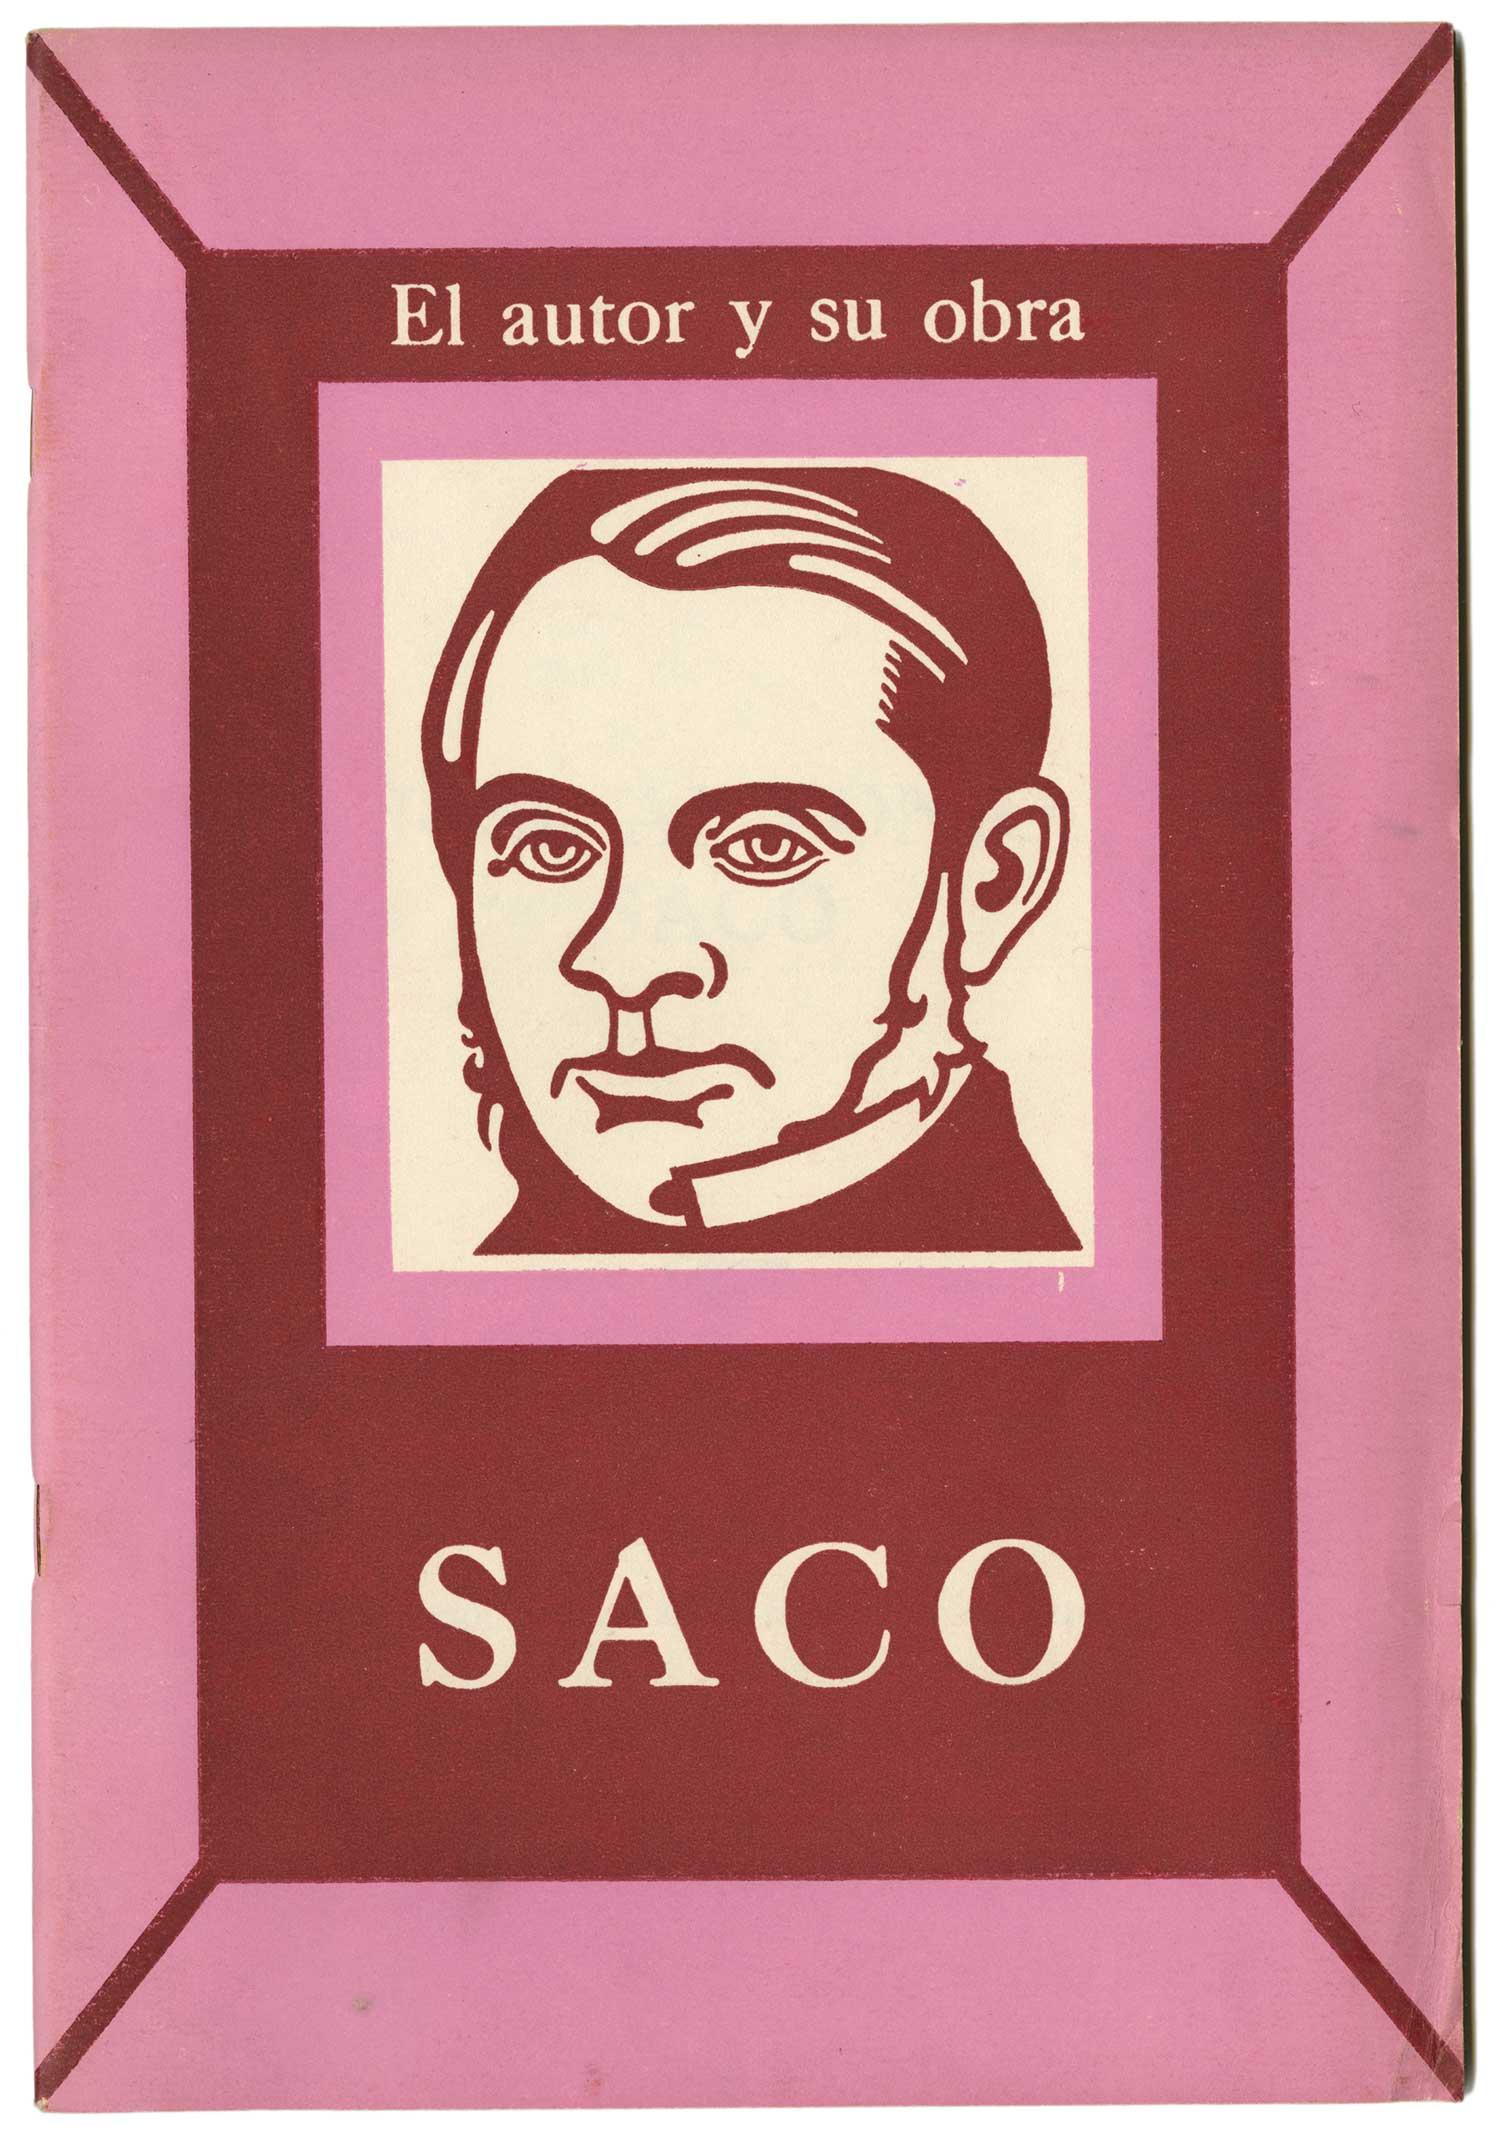 ElAutor_Saco